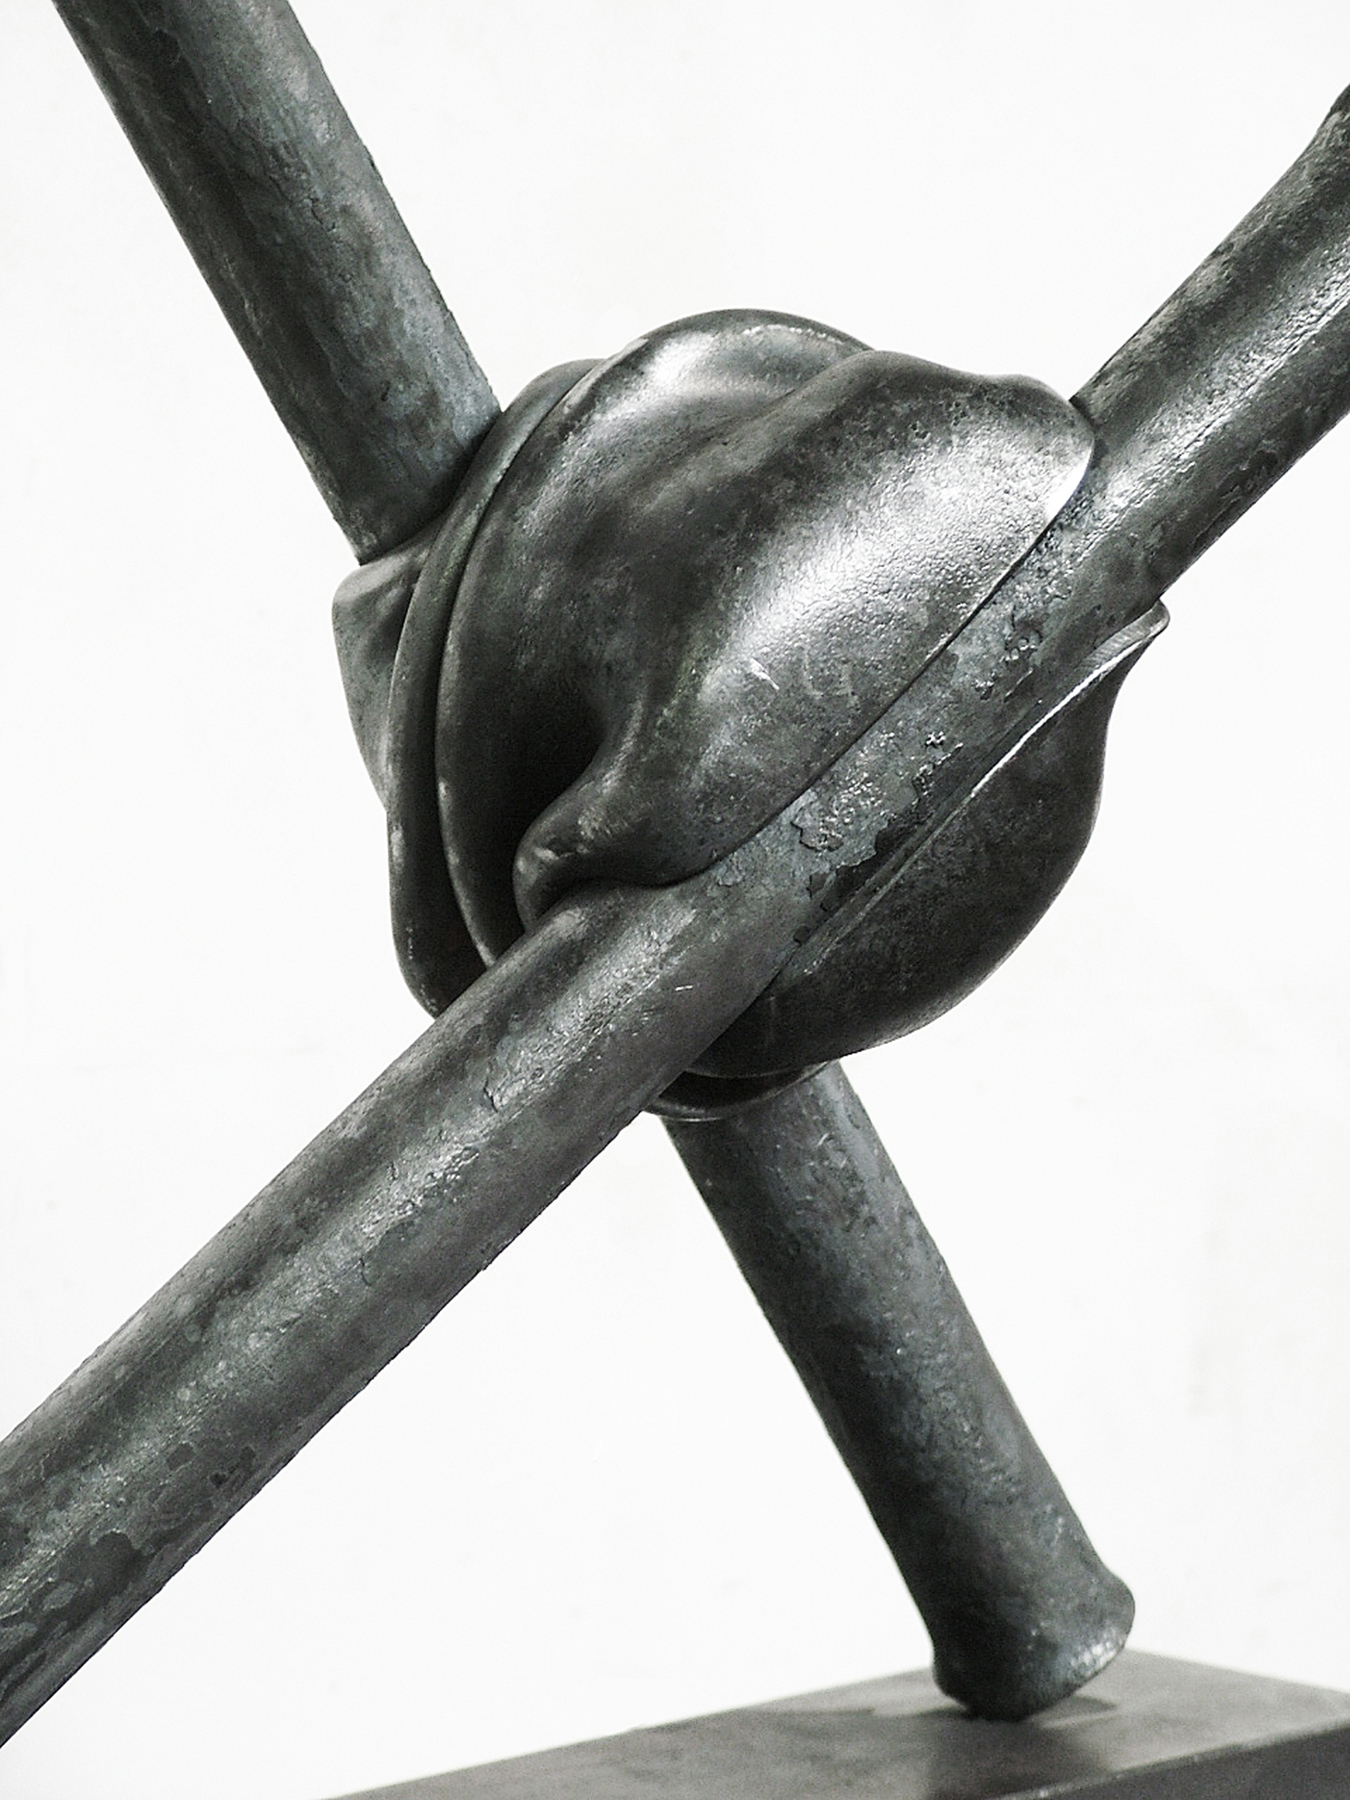 Detail of 3